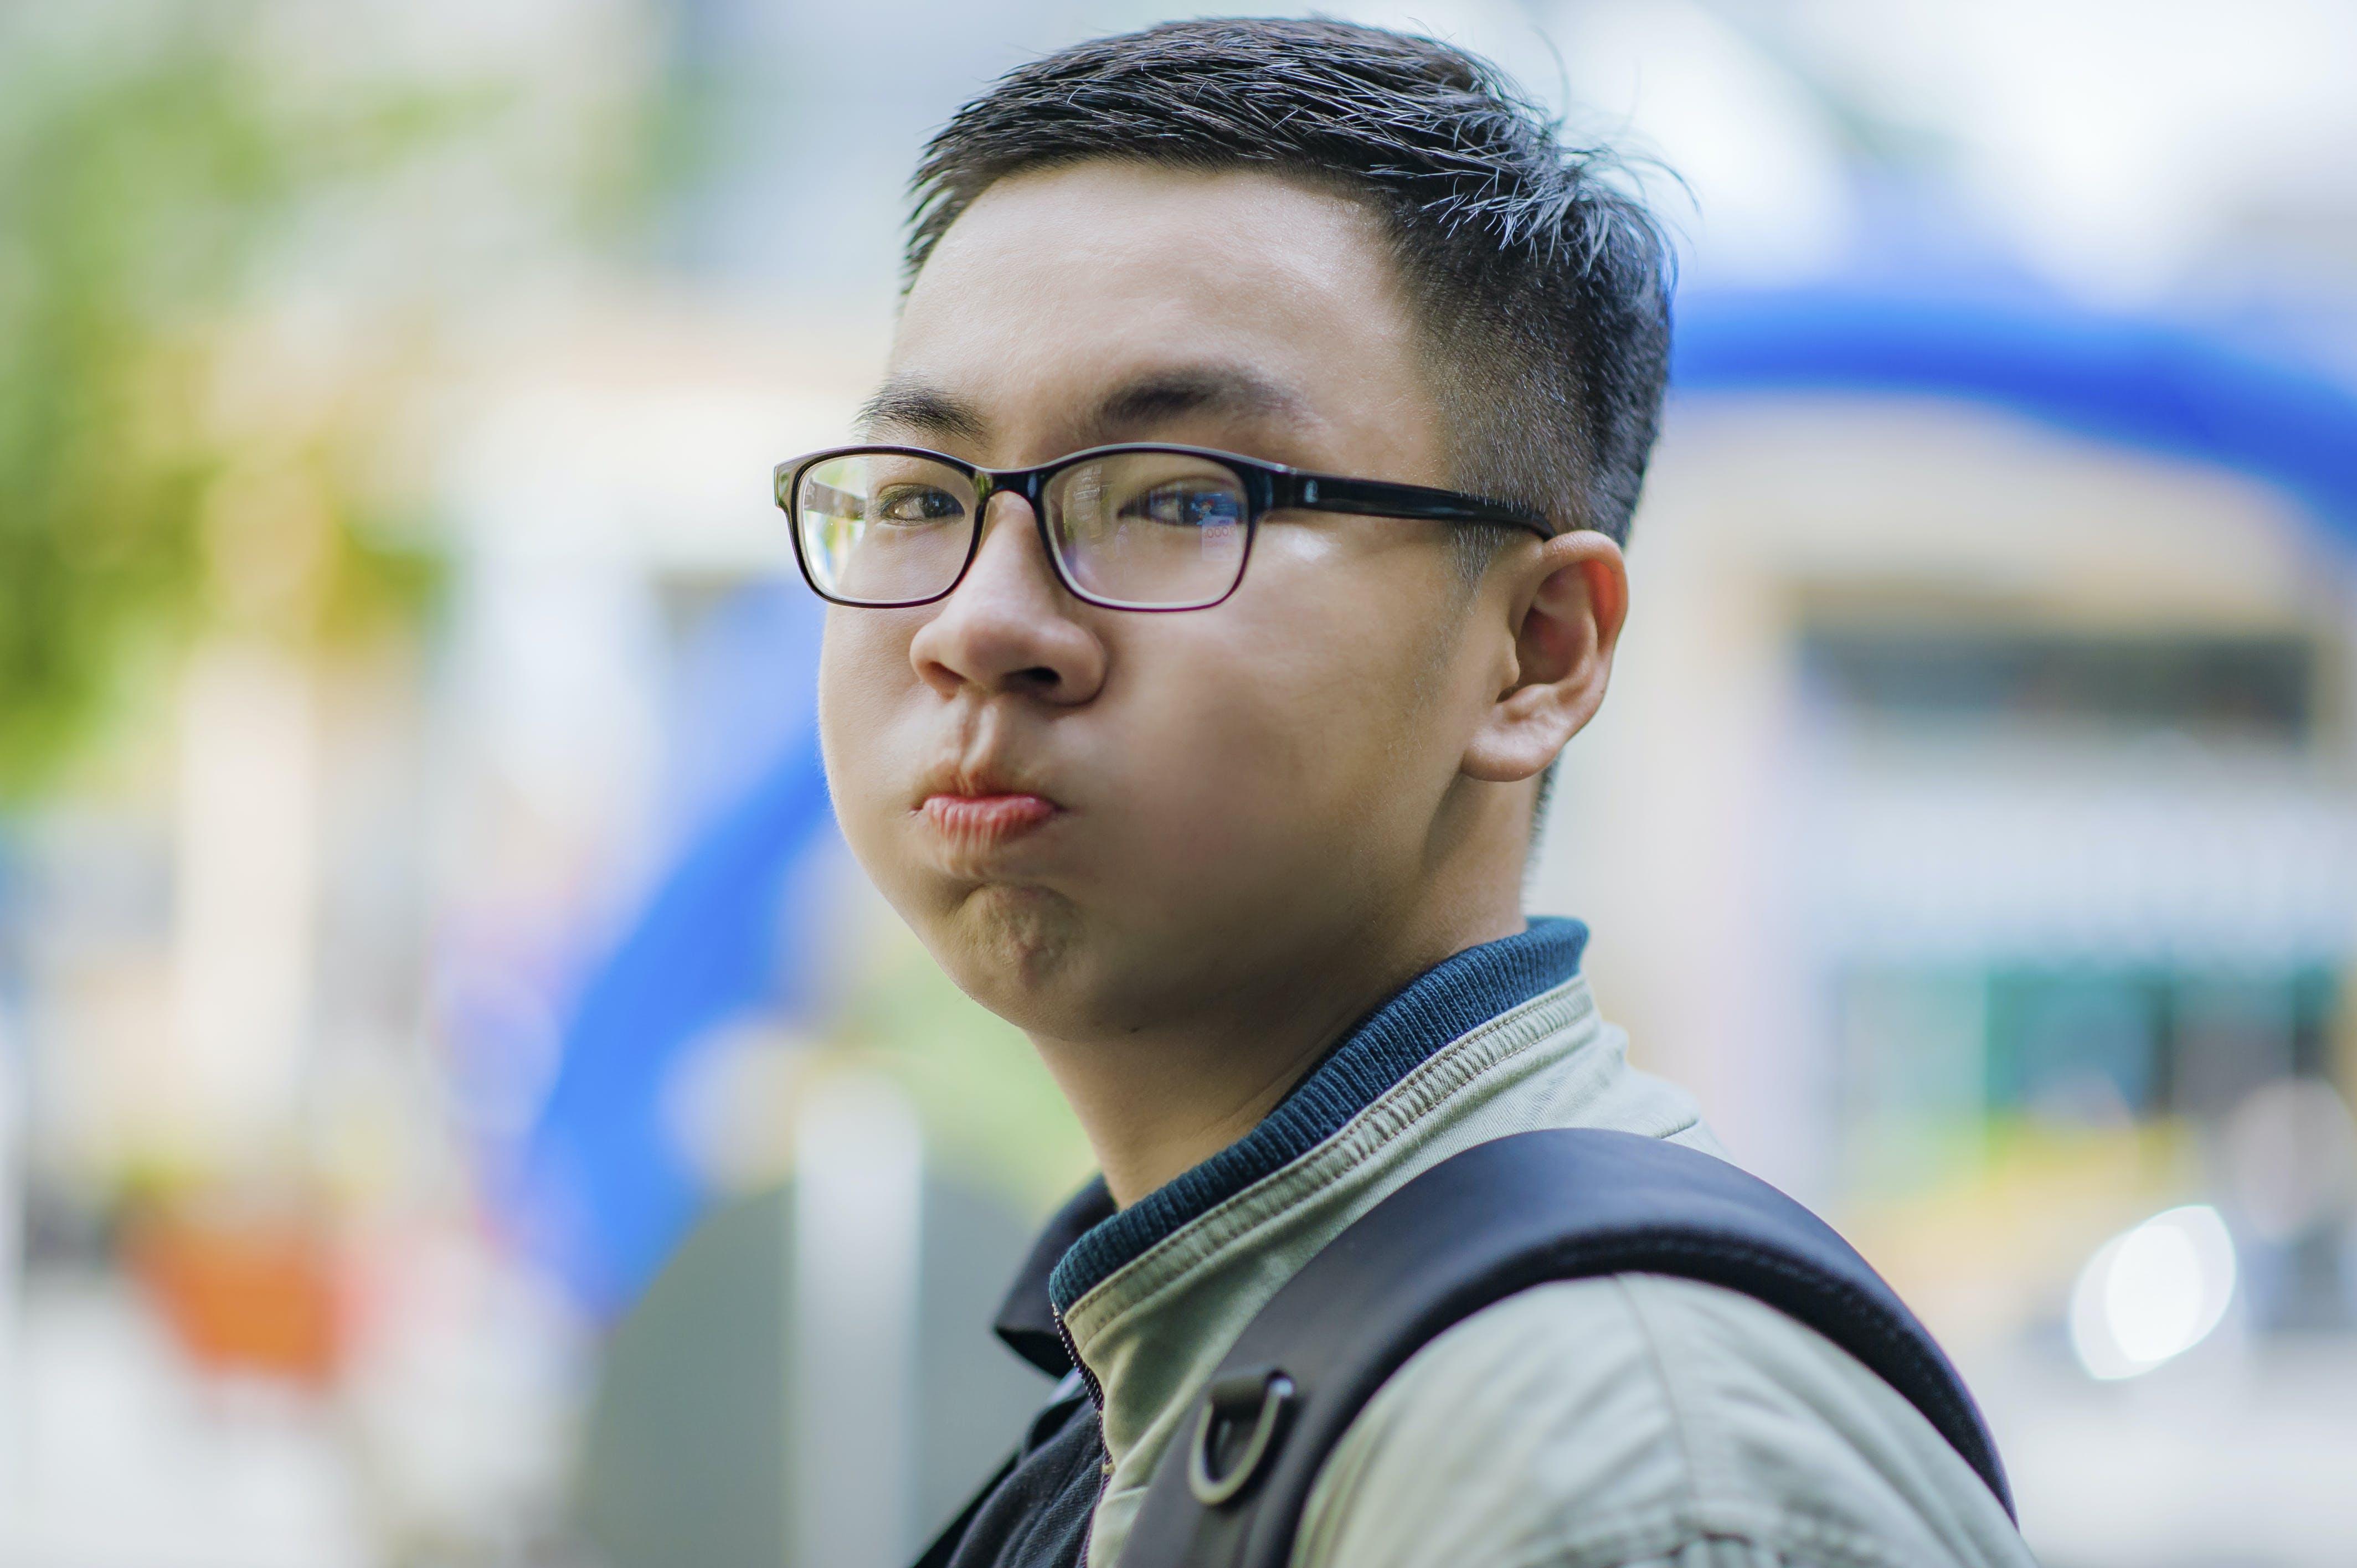 Man Wearing Gray Jacket and Black Framed Eyeglasses